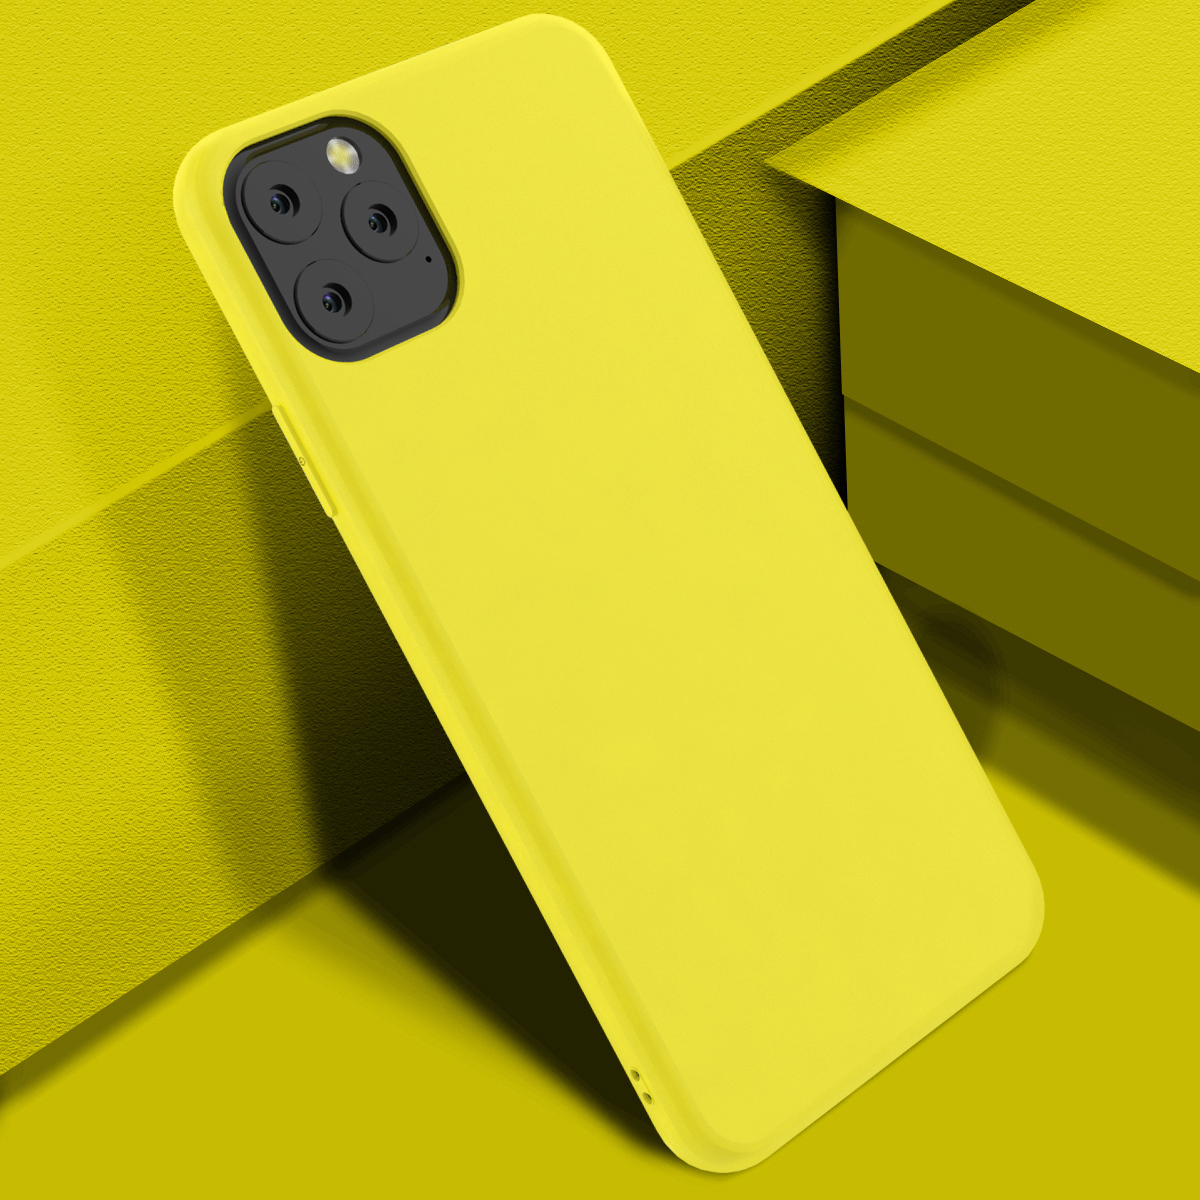 Torubia Silicone Case for iPhone 11/11 Pro/11 Pro Max 123